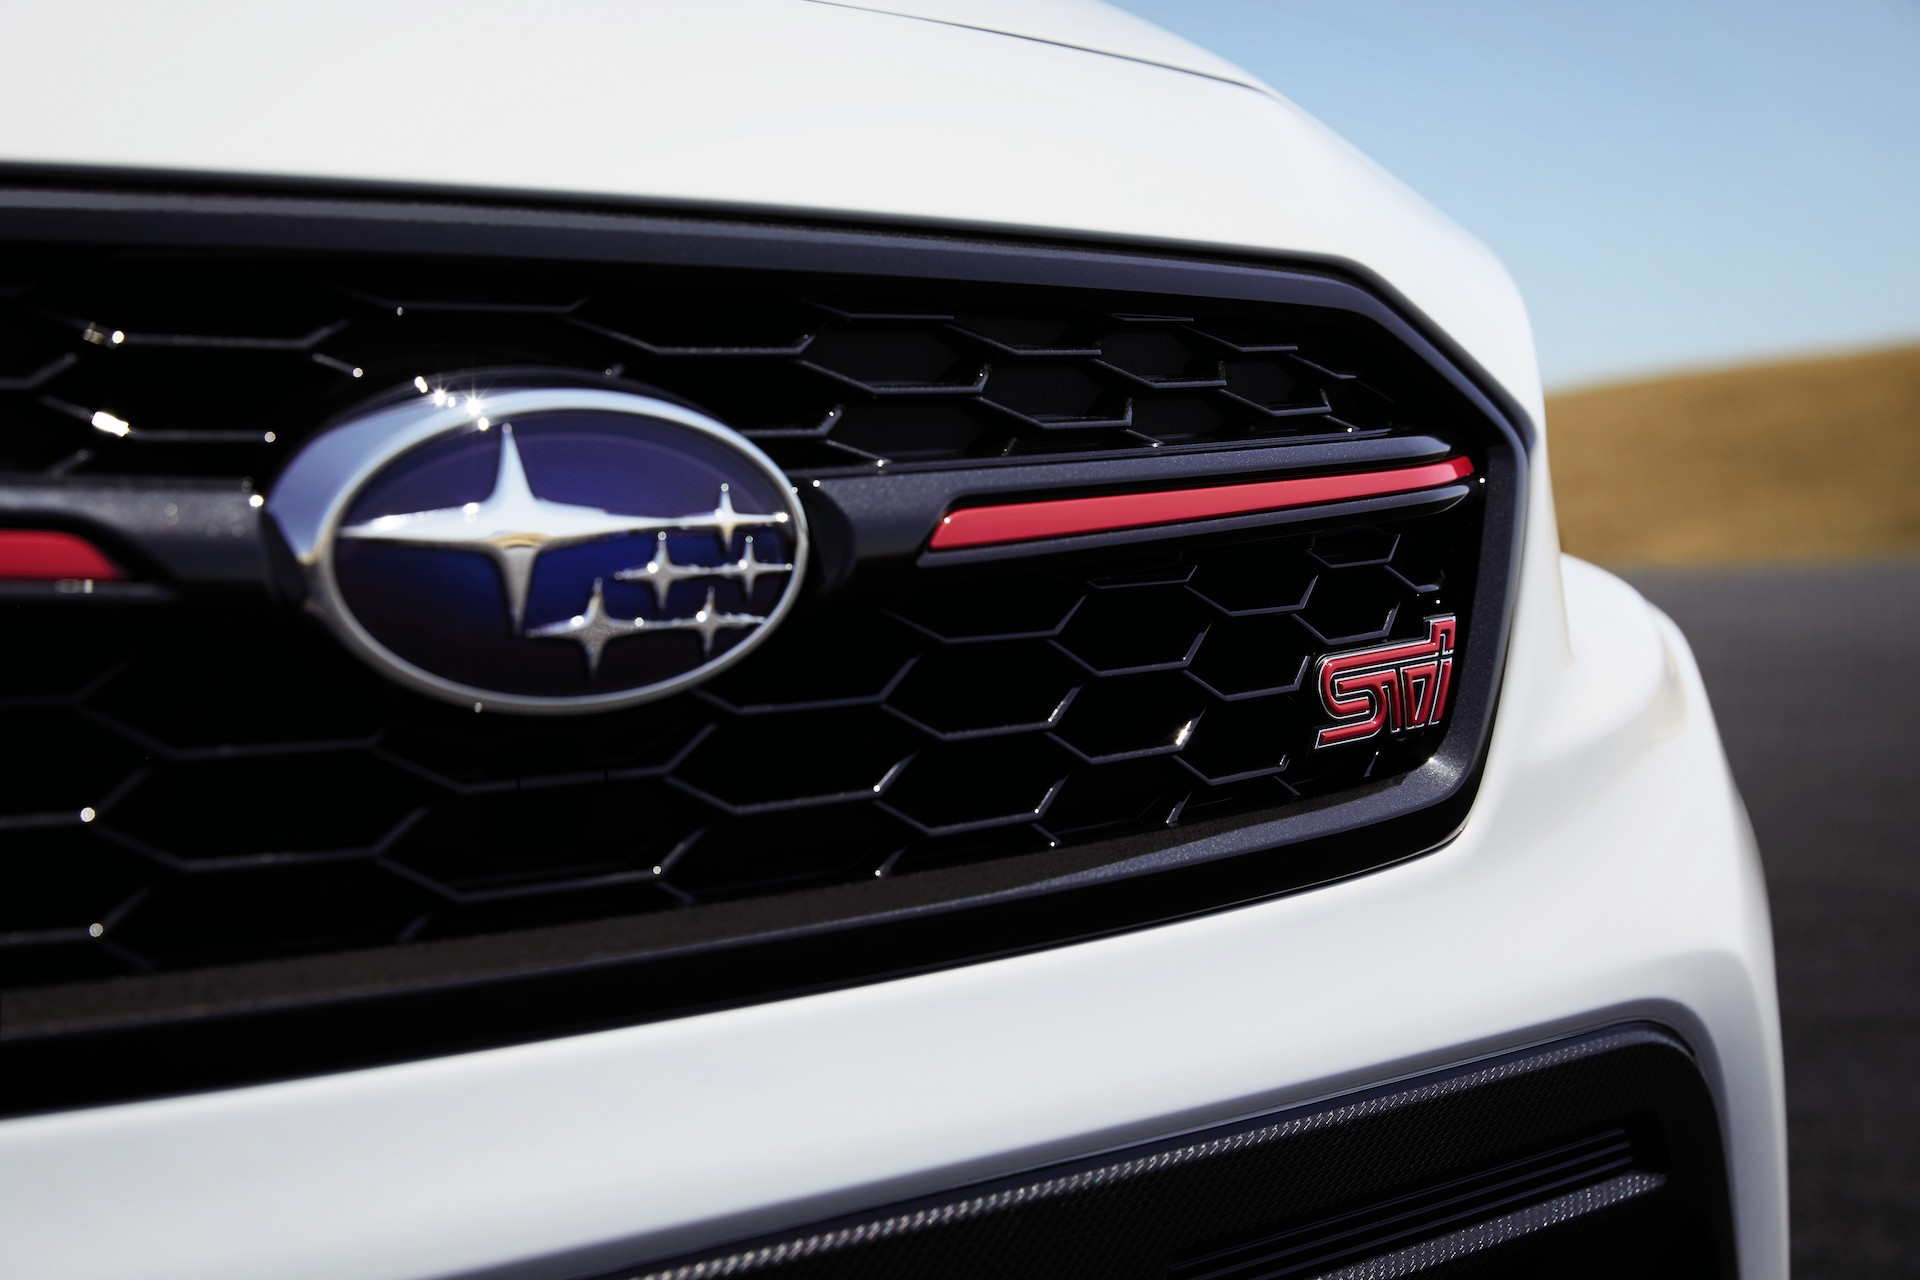 Next Subaru Wrx Sti Reportedly Coming